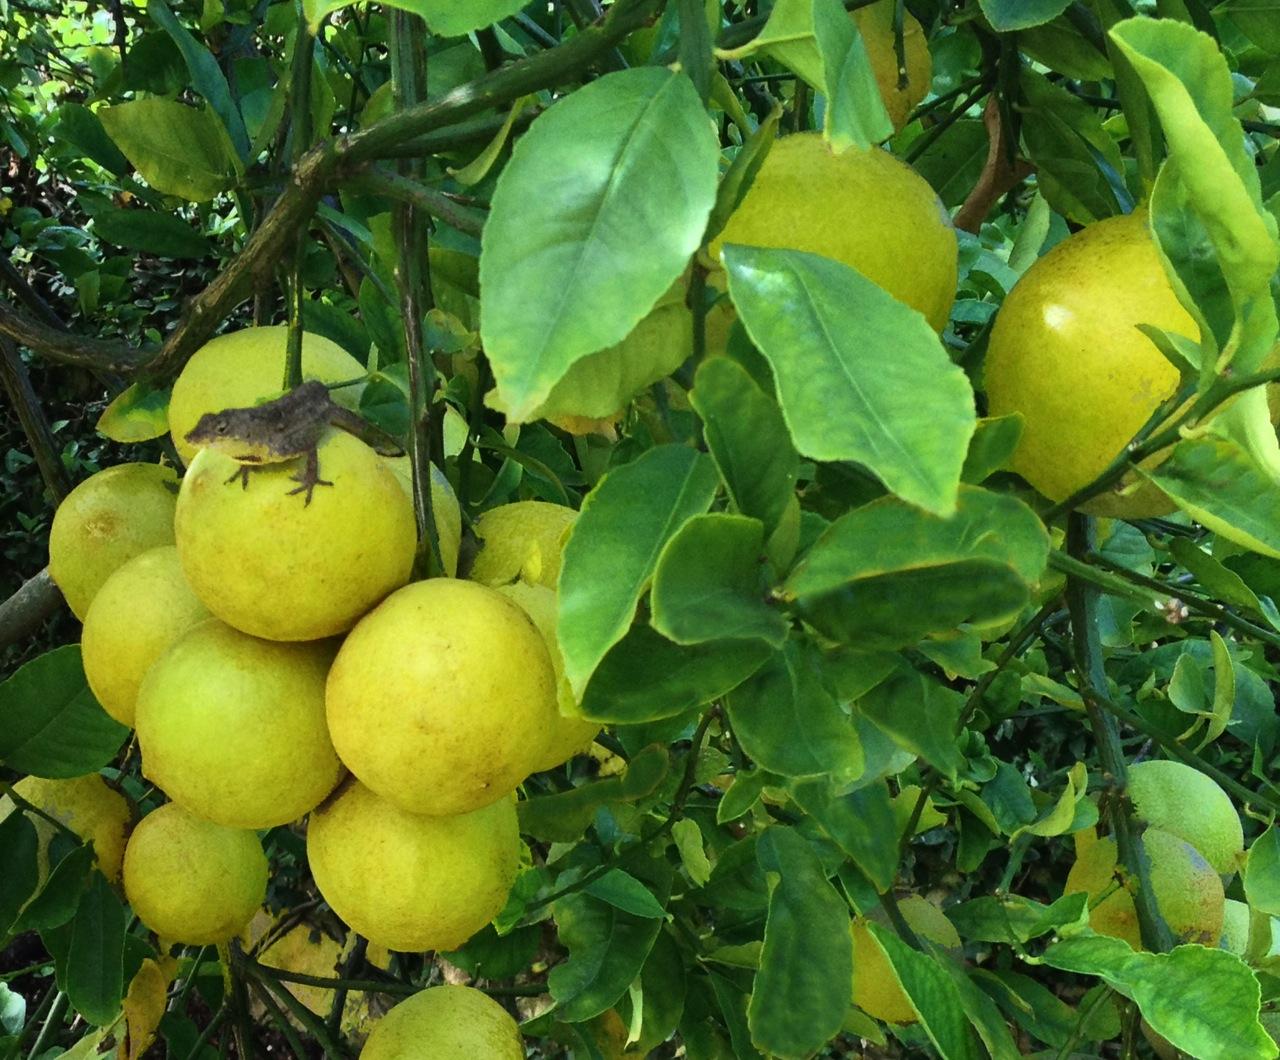 Our Meyer lemon tree